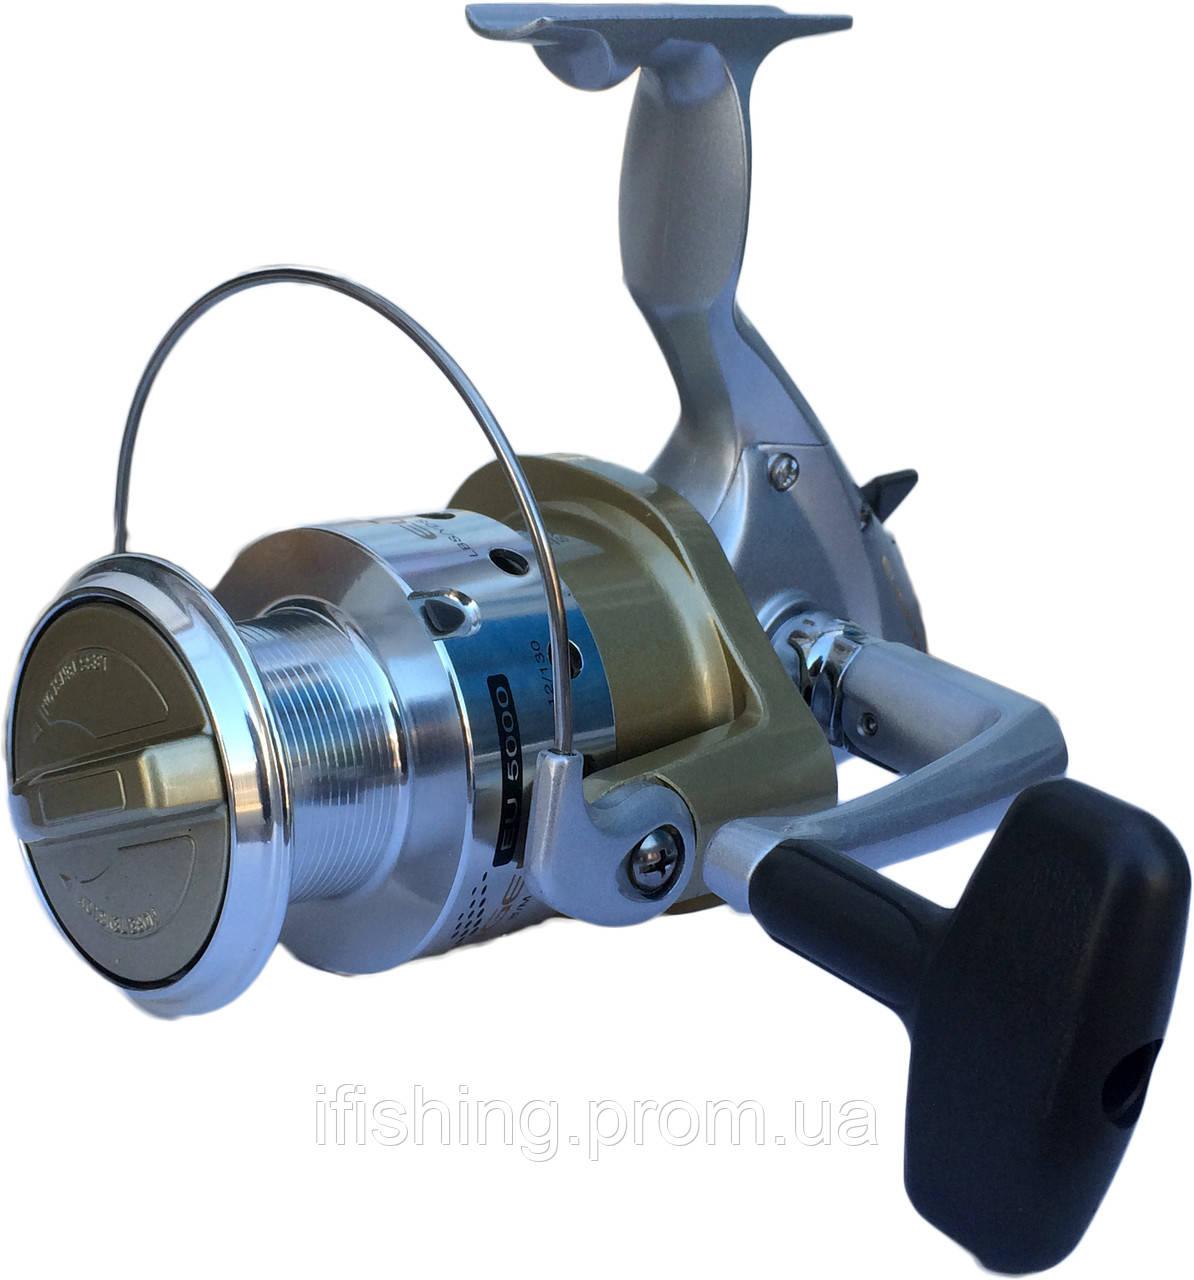 катушка рыболовная line winder eu3000